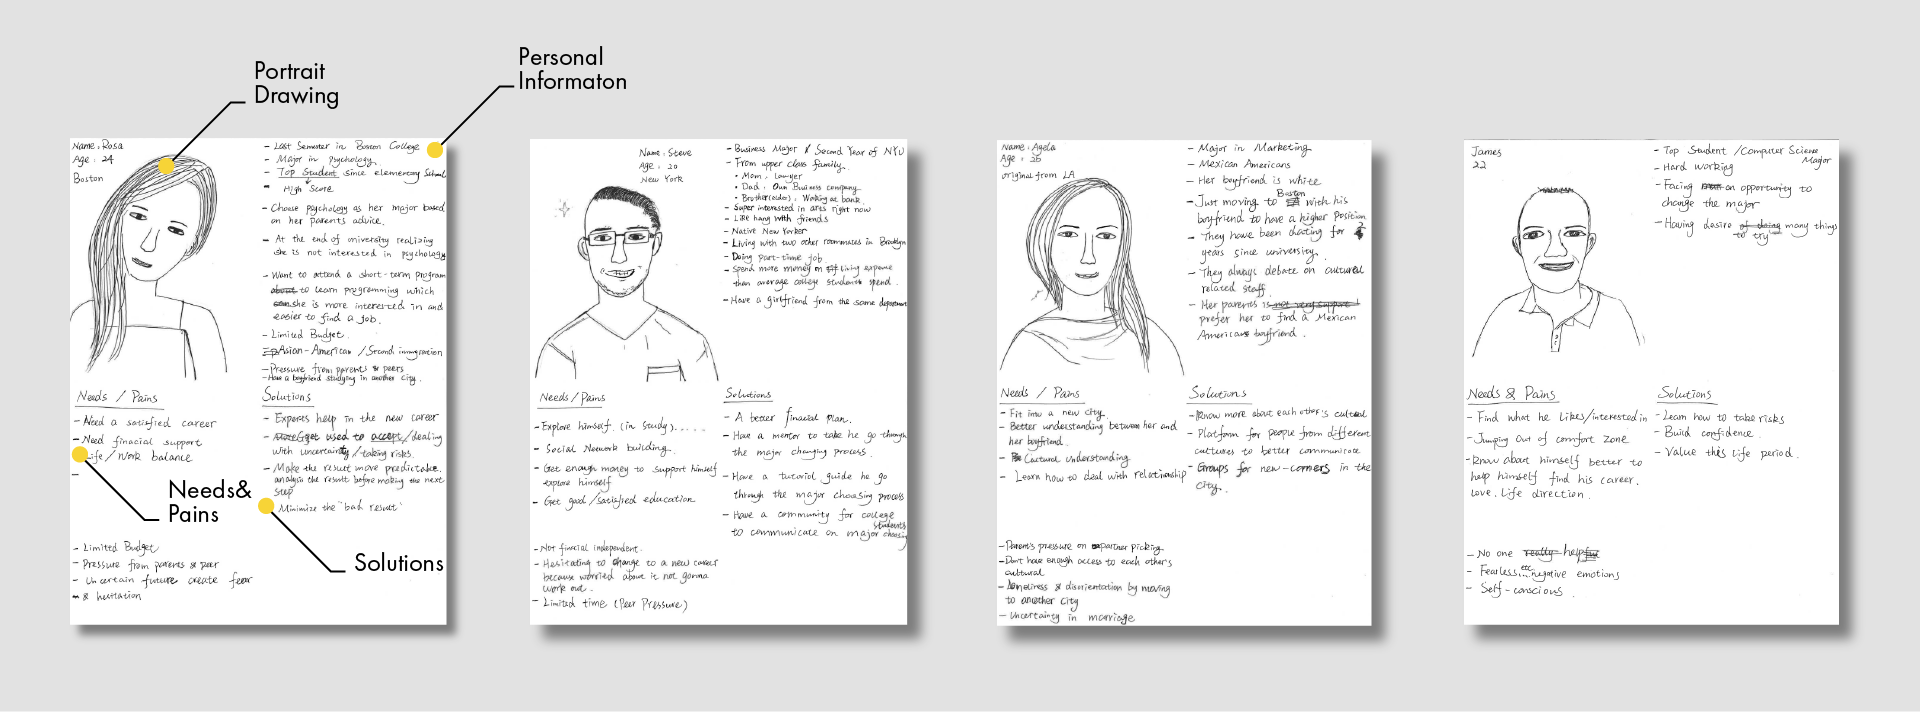 Design Process-04.png